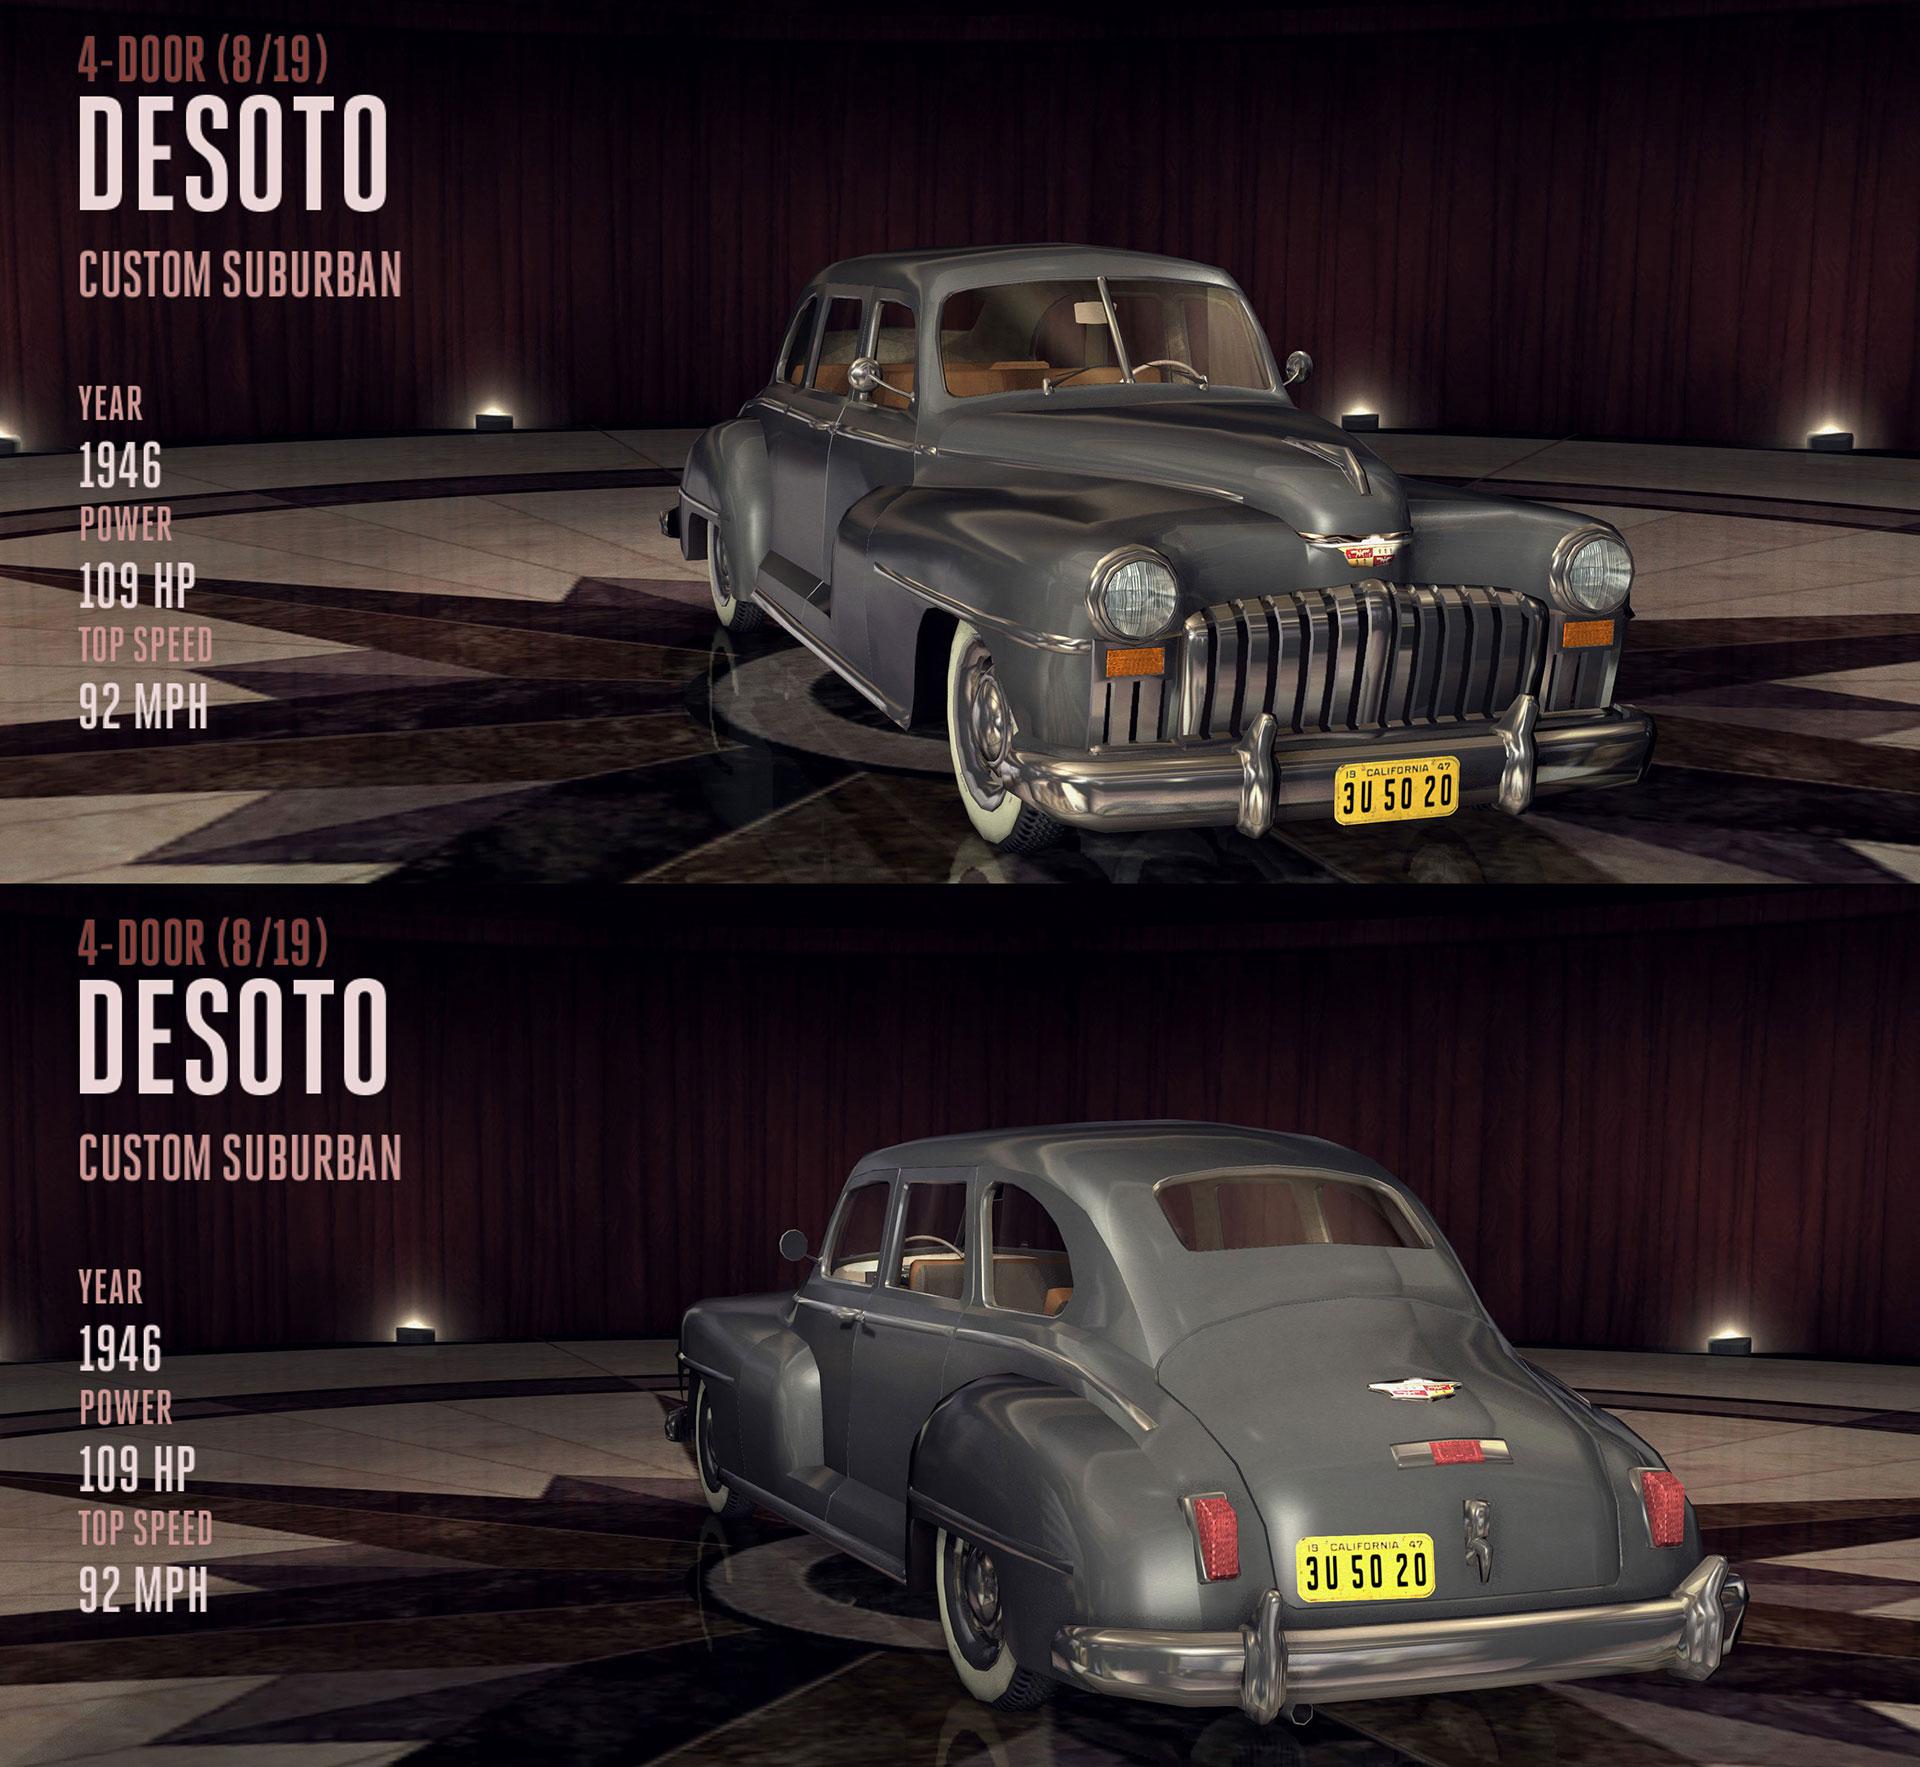 File:1946-desoto-custom-suburban.jpg